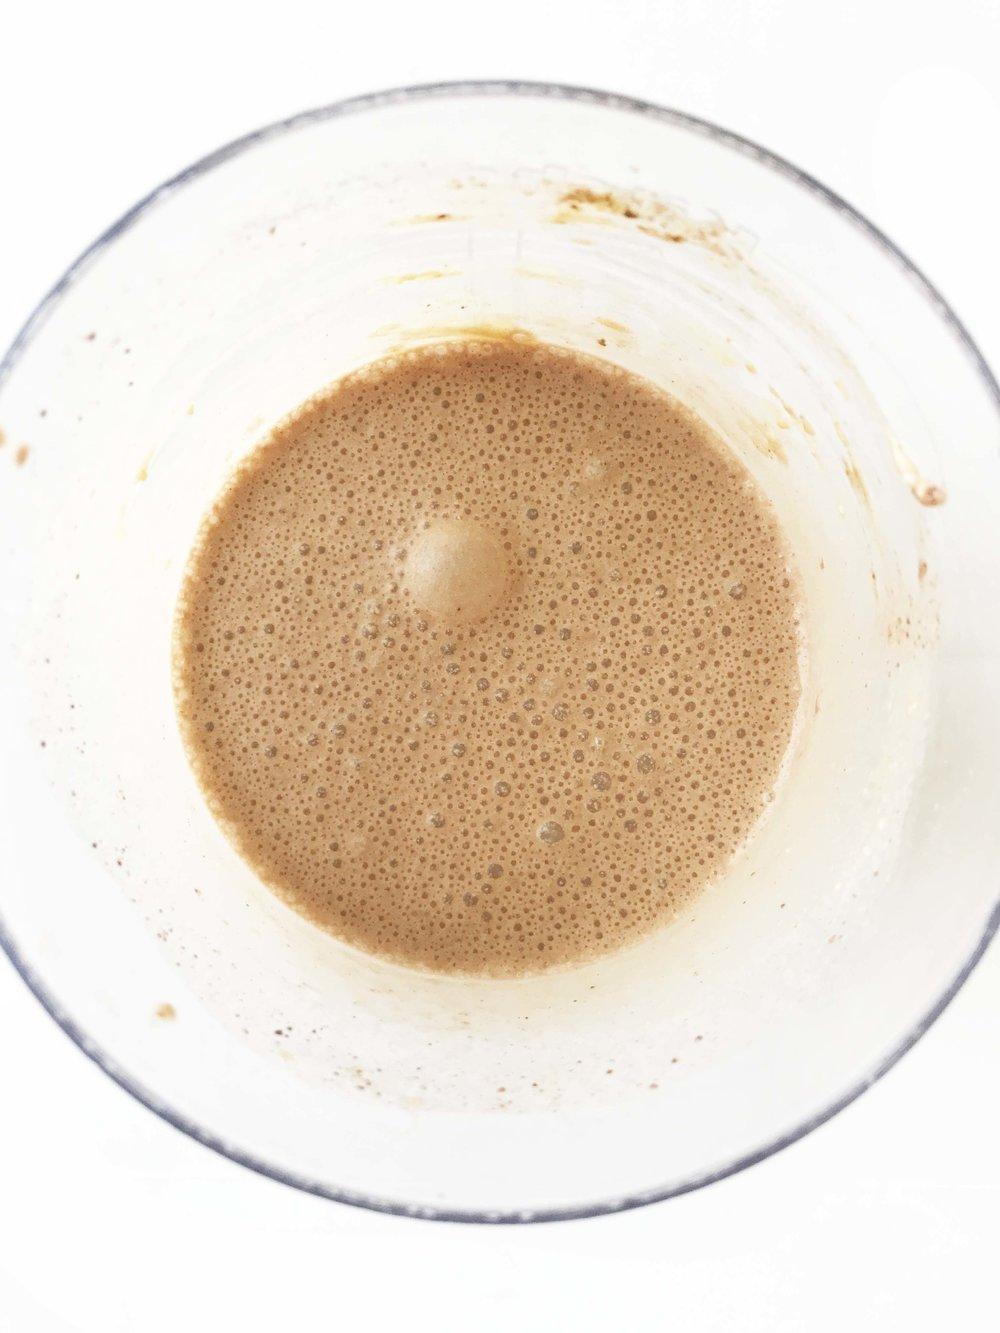 keto-chocolate-pb-shake7.jpg